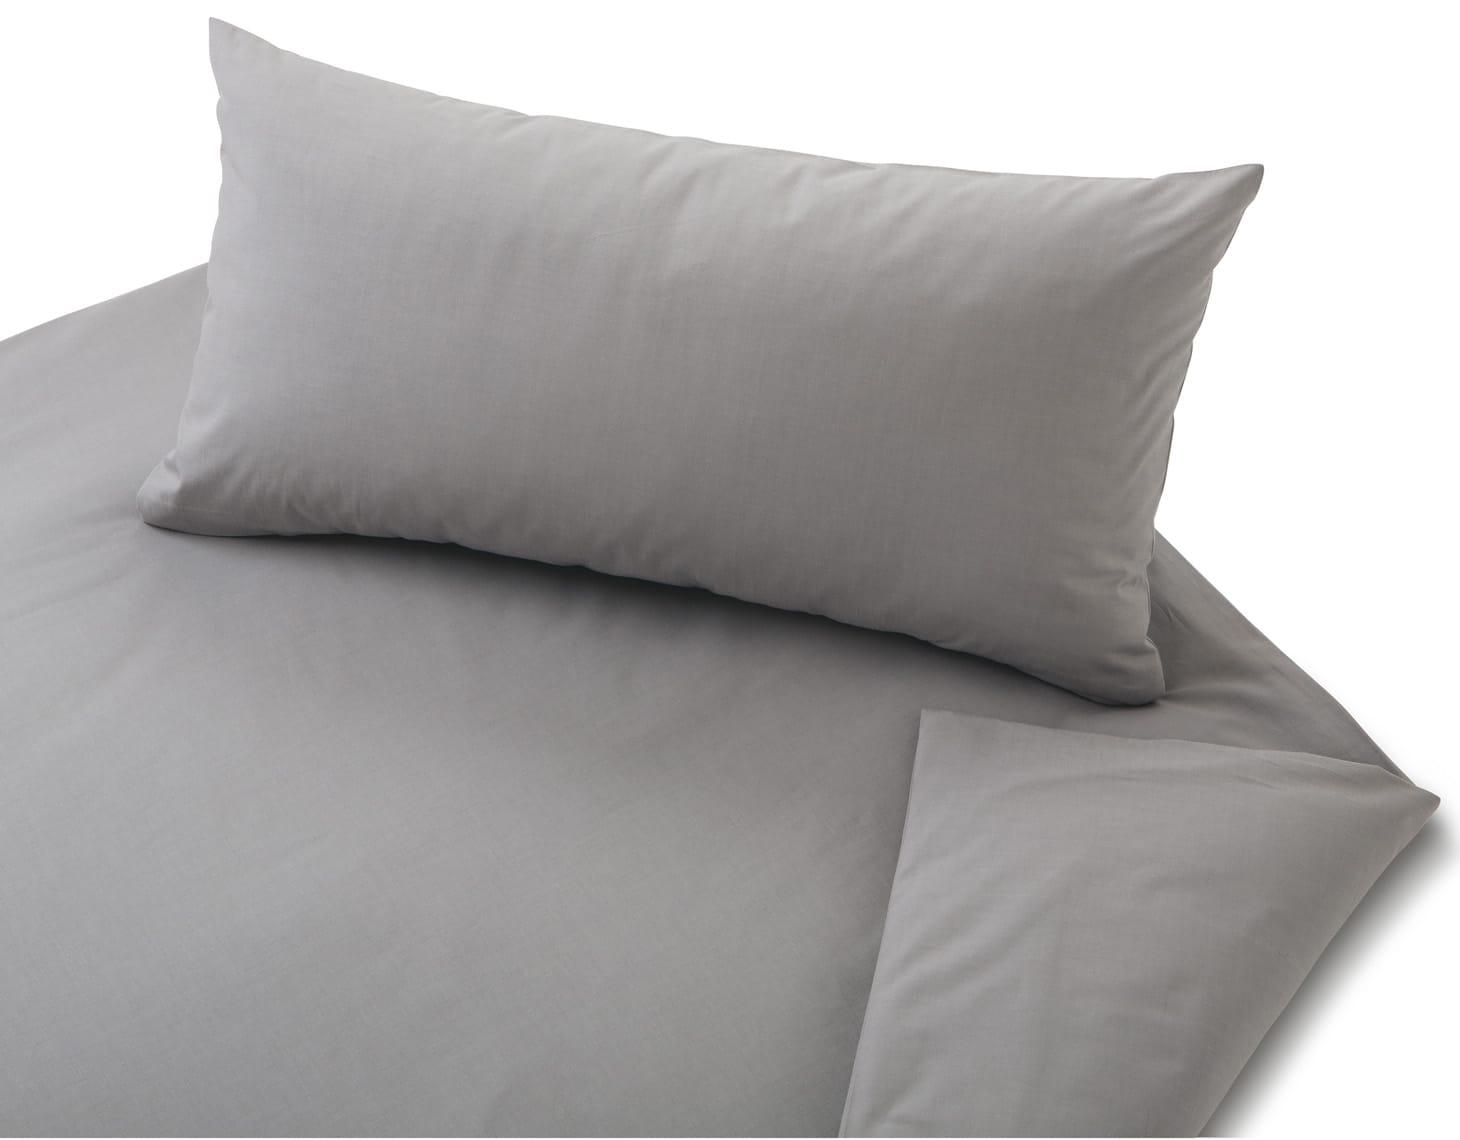 perkal bettw sche chambray biom bel bonn. Black Bedroom Furniture Sets. Home Design Ideas